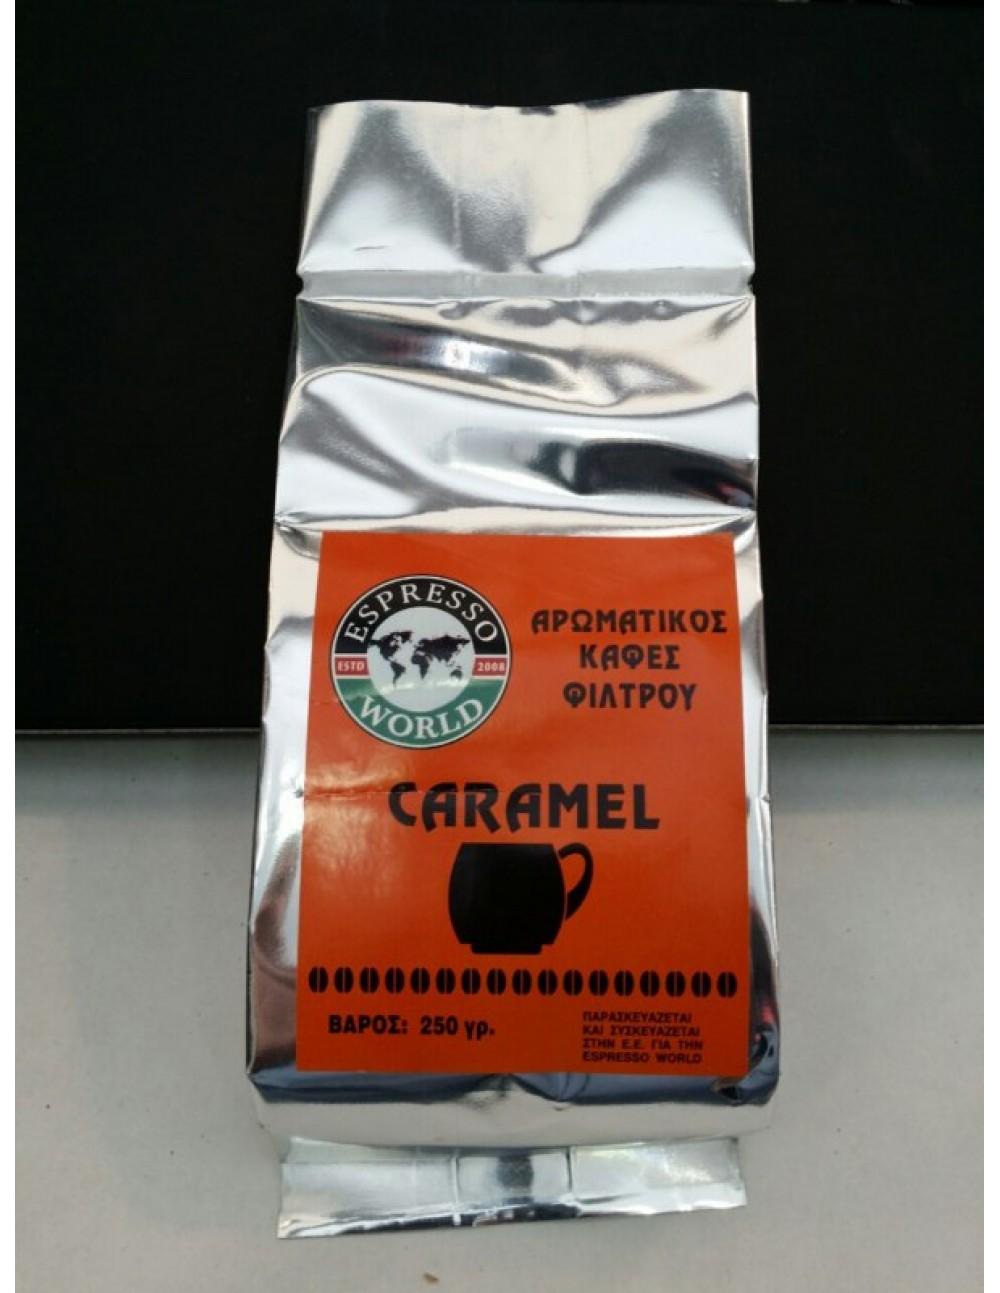 6475f2102a Καφές Φίλτρου με άρωμα καραμέλας